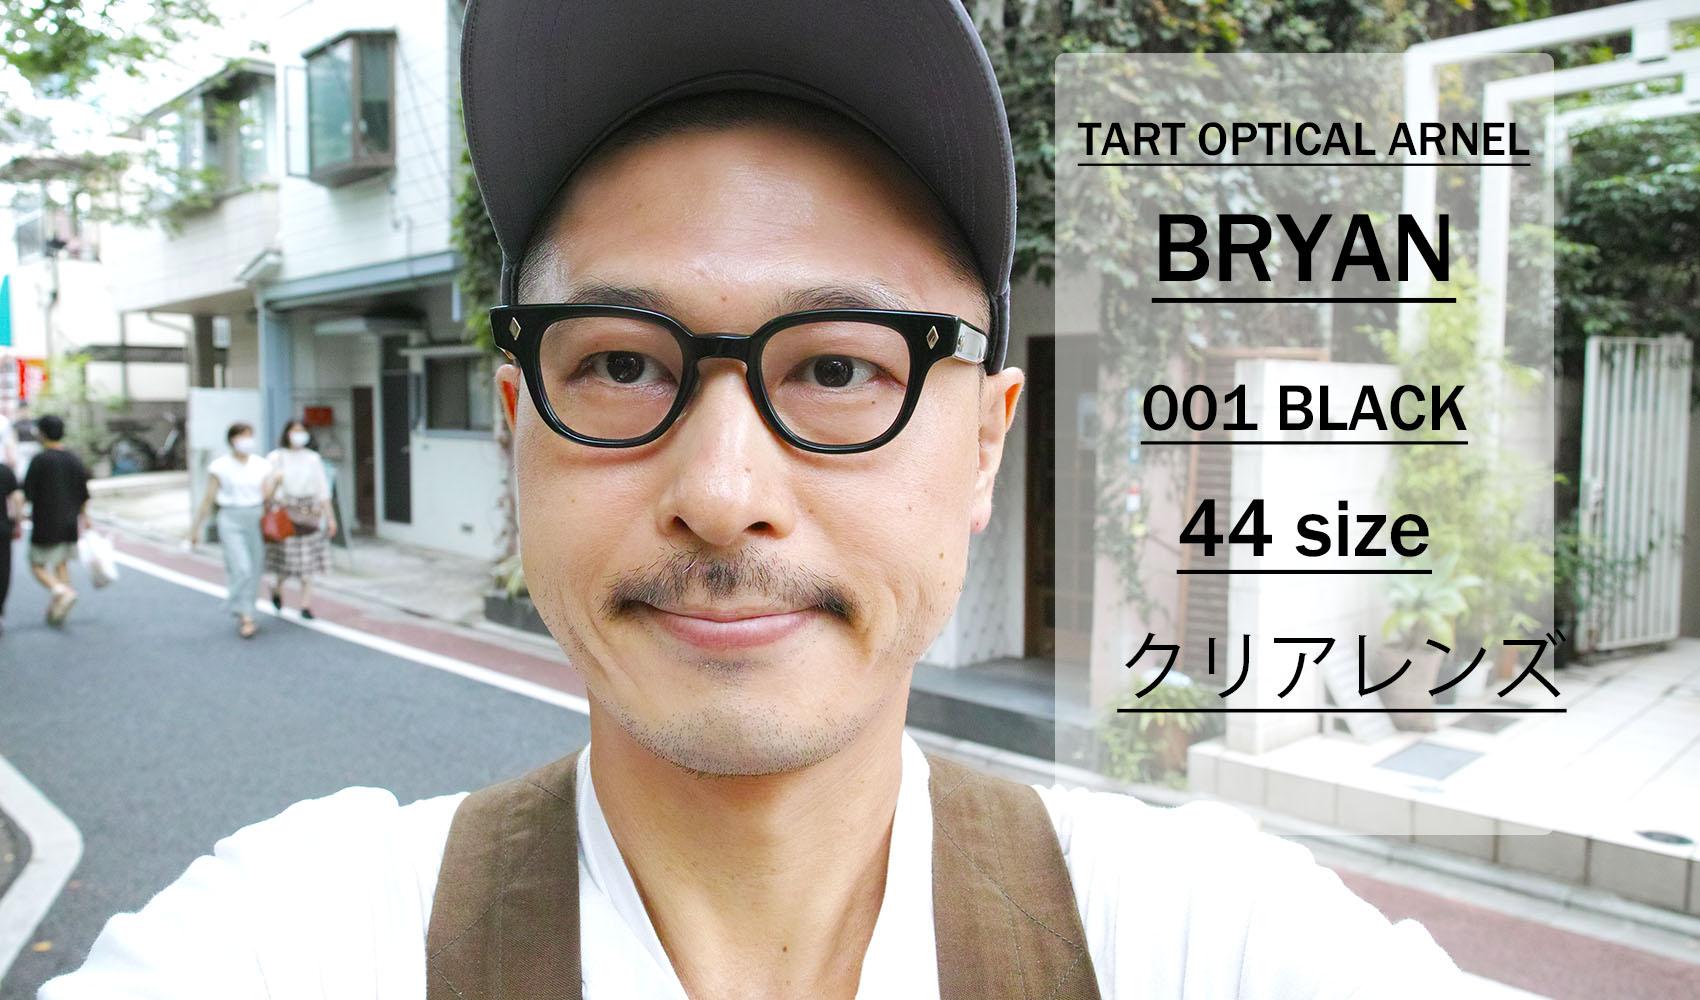 TART OPTICAL ARNEL / BRYAN / 001 Black / 44 size